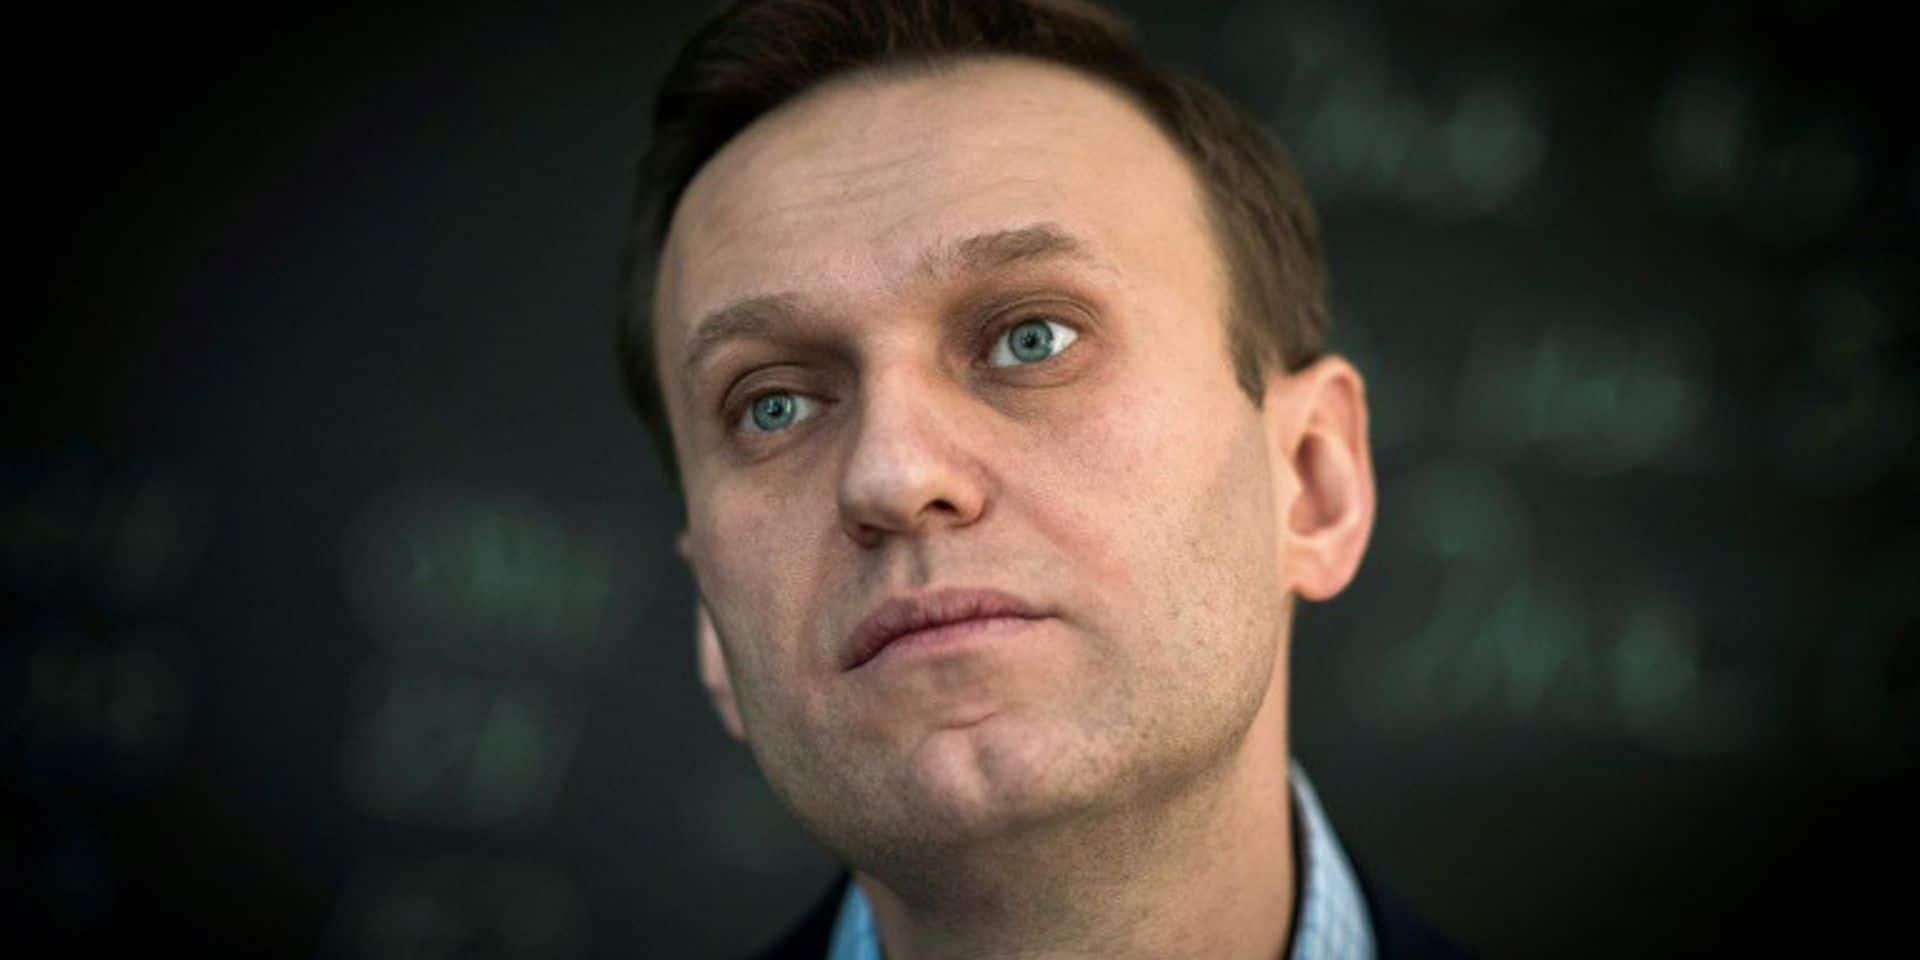 Skripal, Litvinenko, Verzilov: avant Alexeï Navalny, plusieurs personnalités russes ont été victimes d'empoisonnement